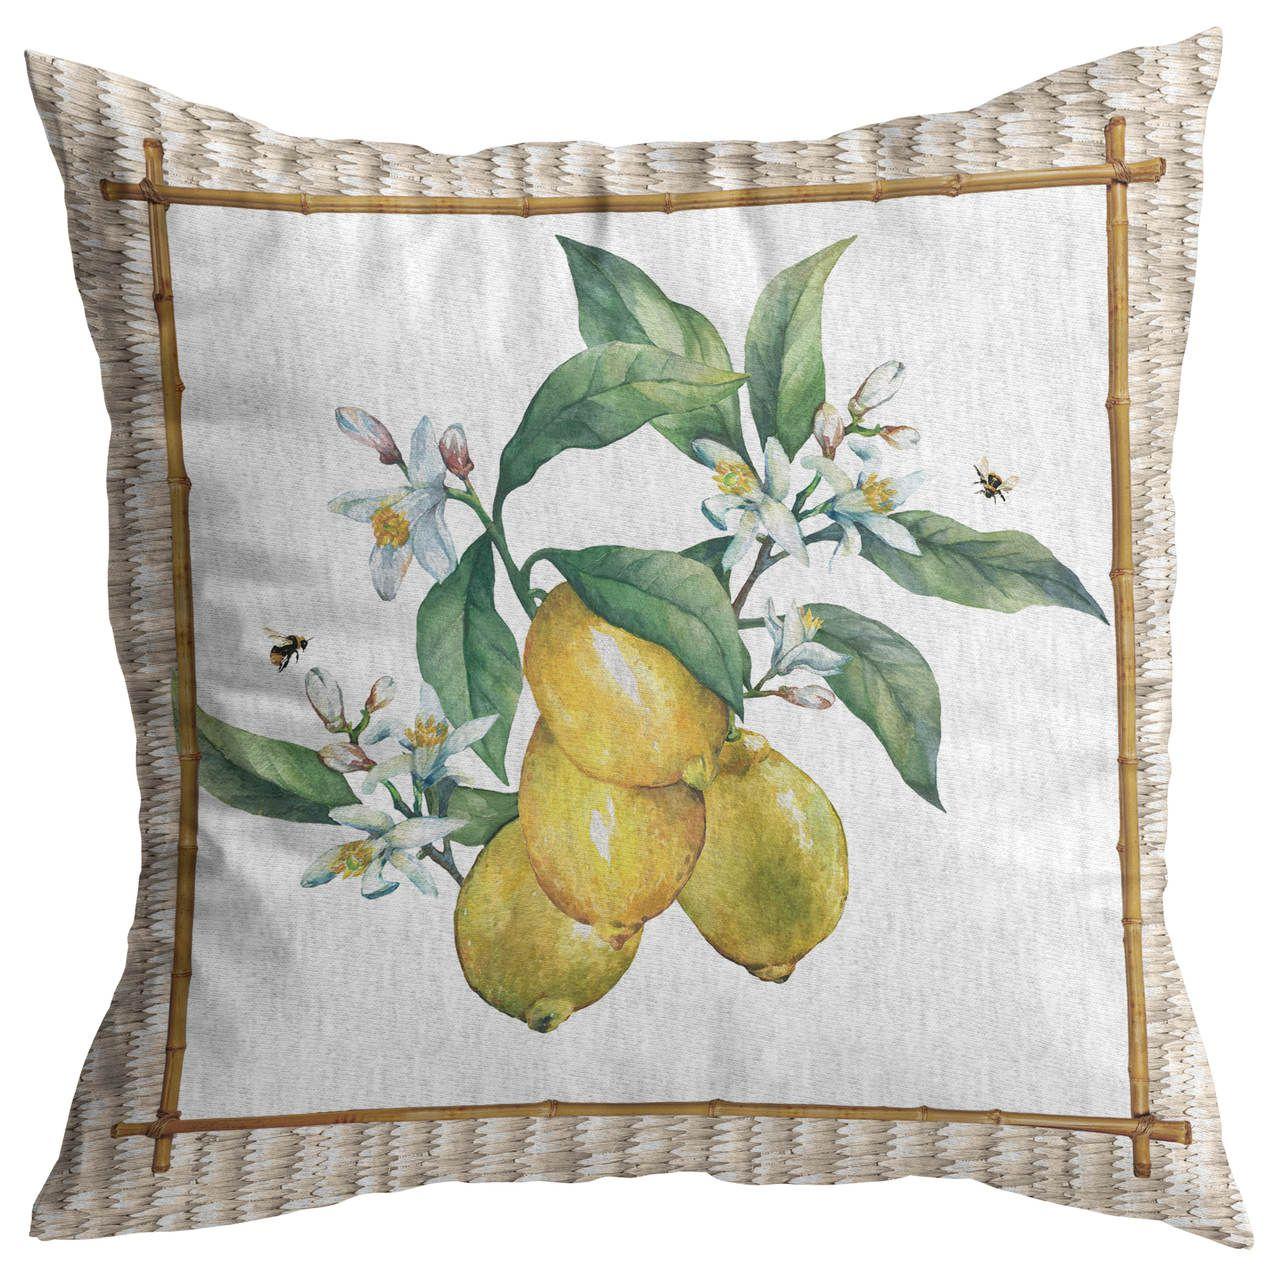 Almofada Tropical Fruits Limão Cód.: 4350 - MB